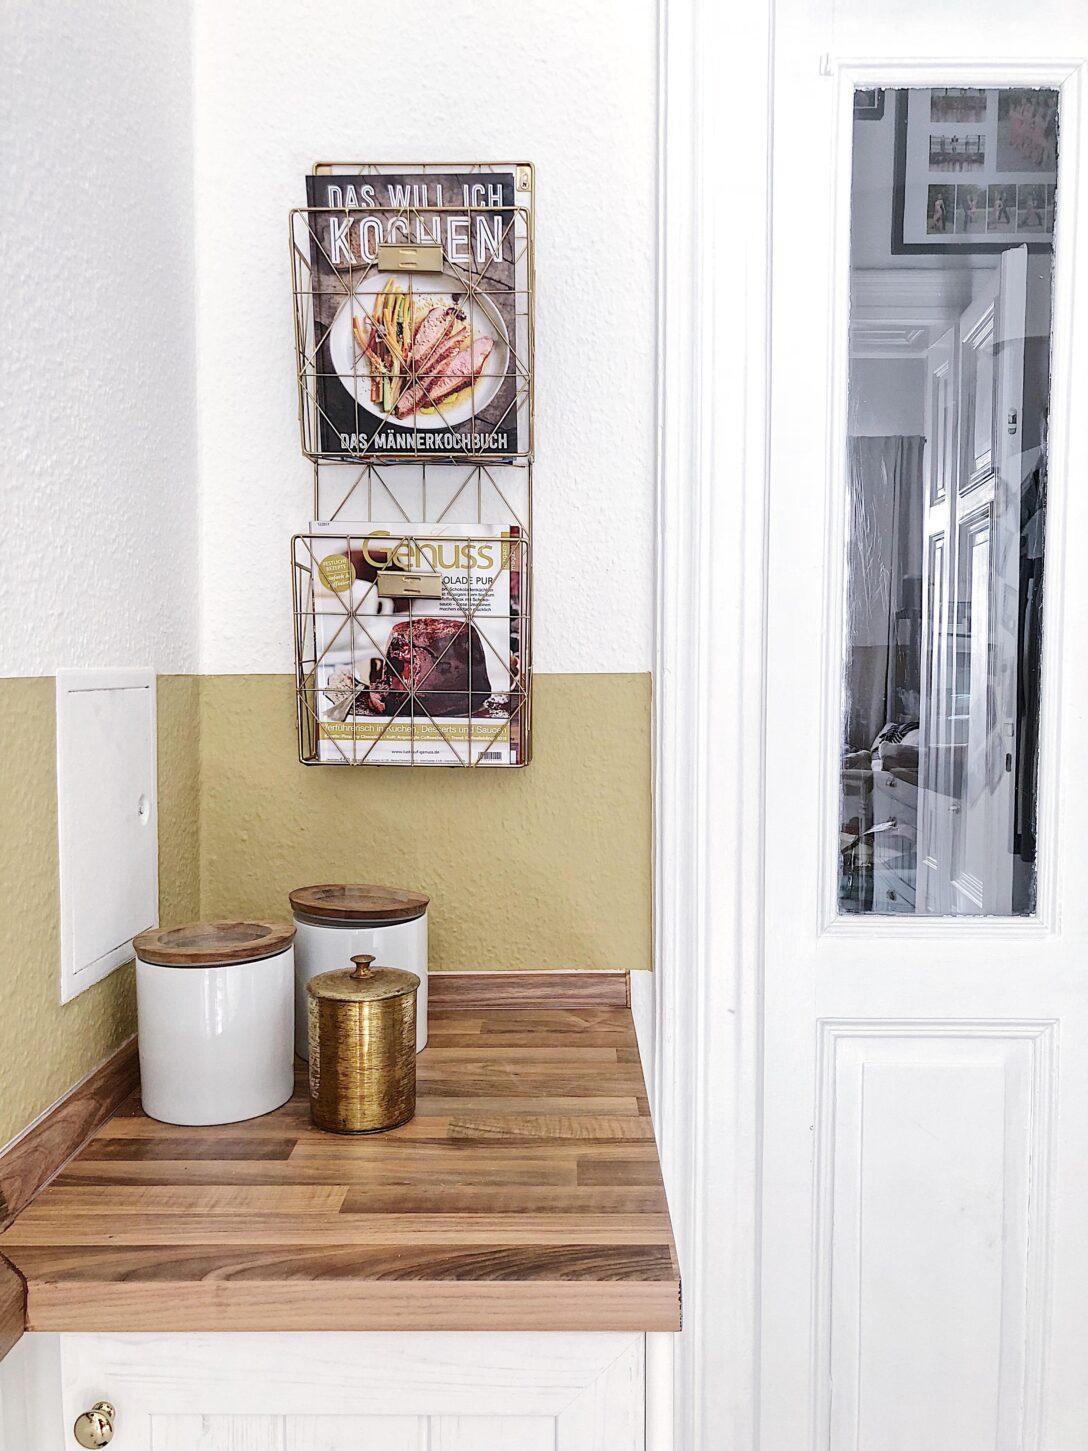 Large Size of Küchen Wandregal Ikea Kche Wandboard Bilder Ideen Couch Betten 160x200 Miniküche Bad Küche Modulküche Sofa Mit Schlaffunktion Regal Kosten Kaufen Bei Wohnzimmer Küchen Wandregal Ikea